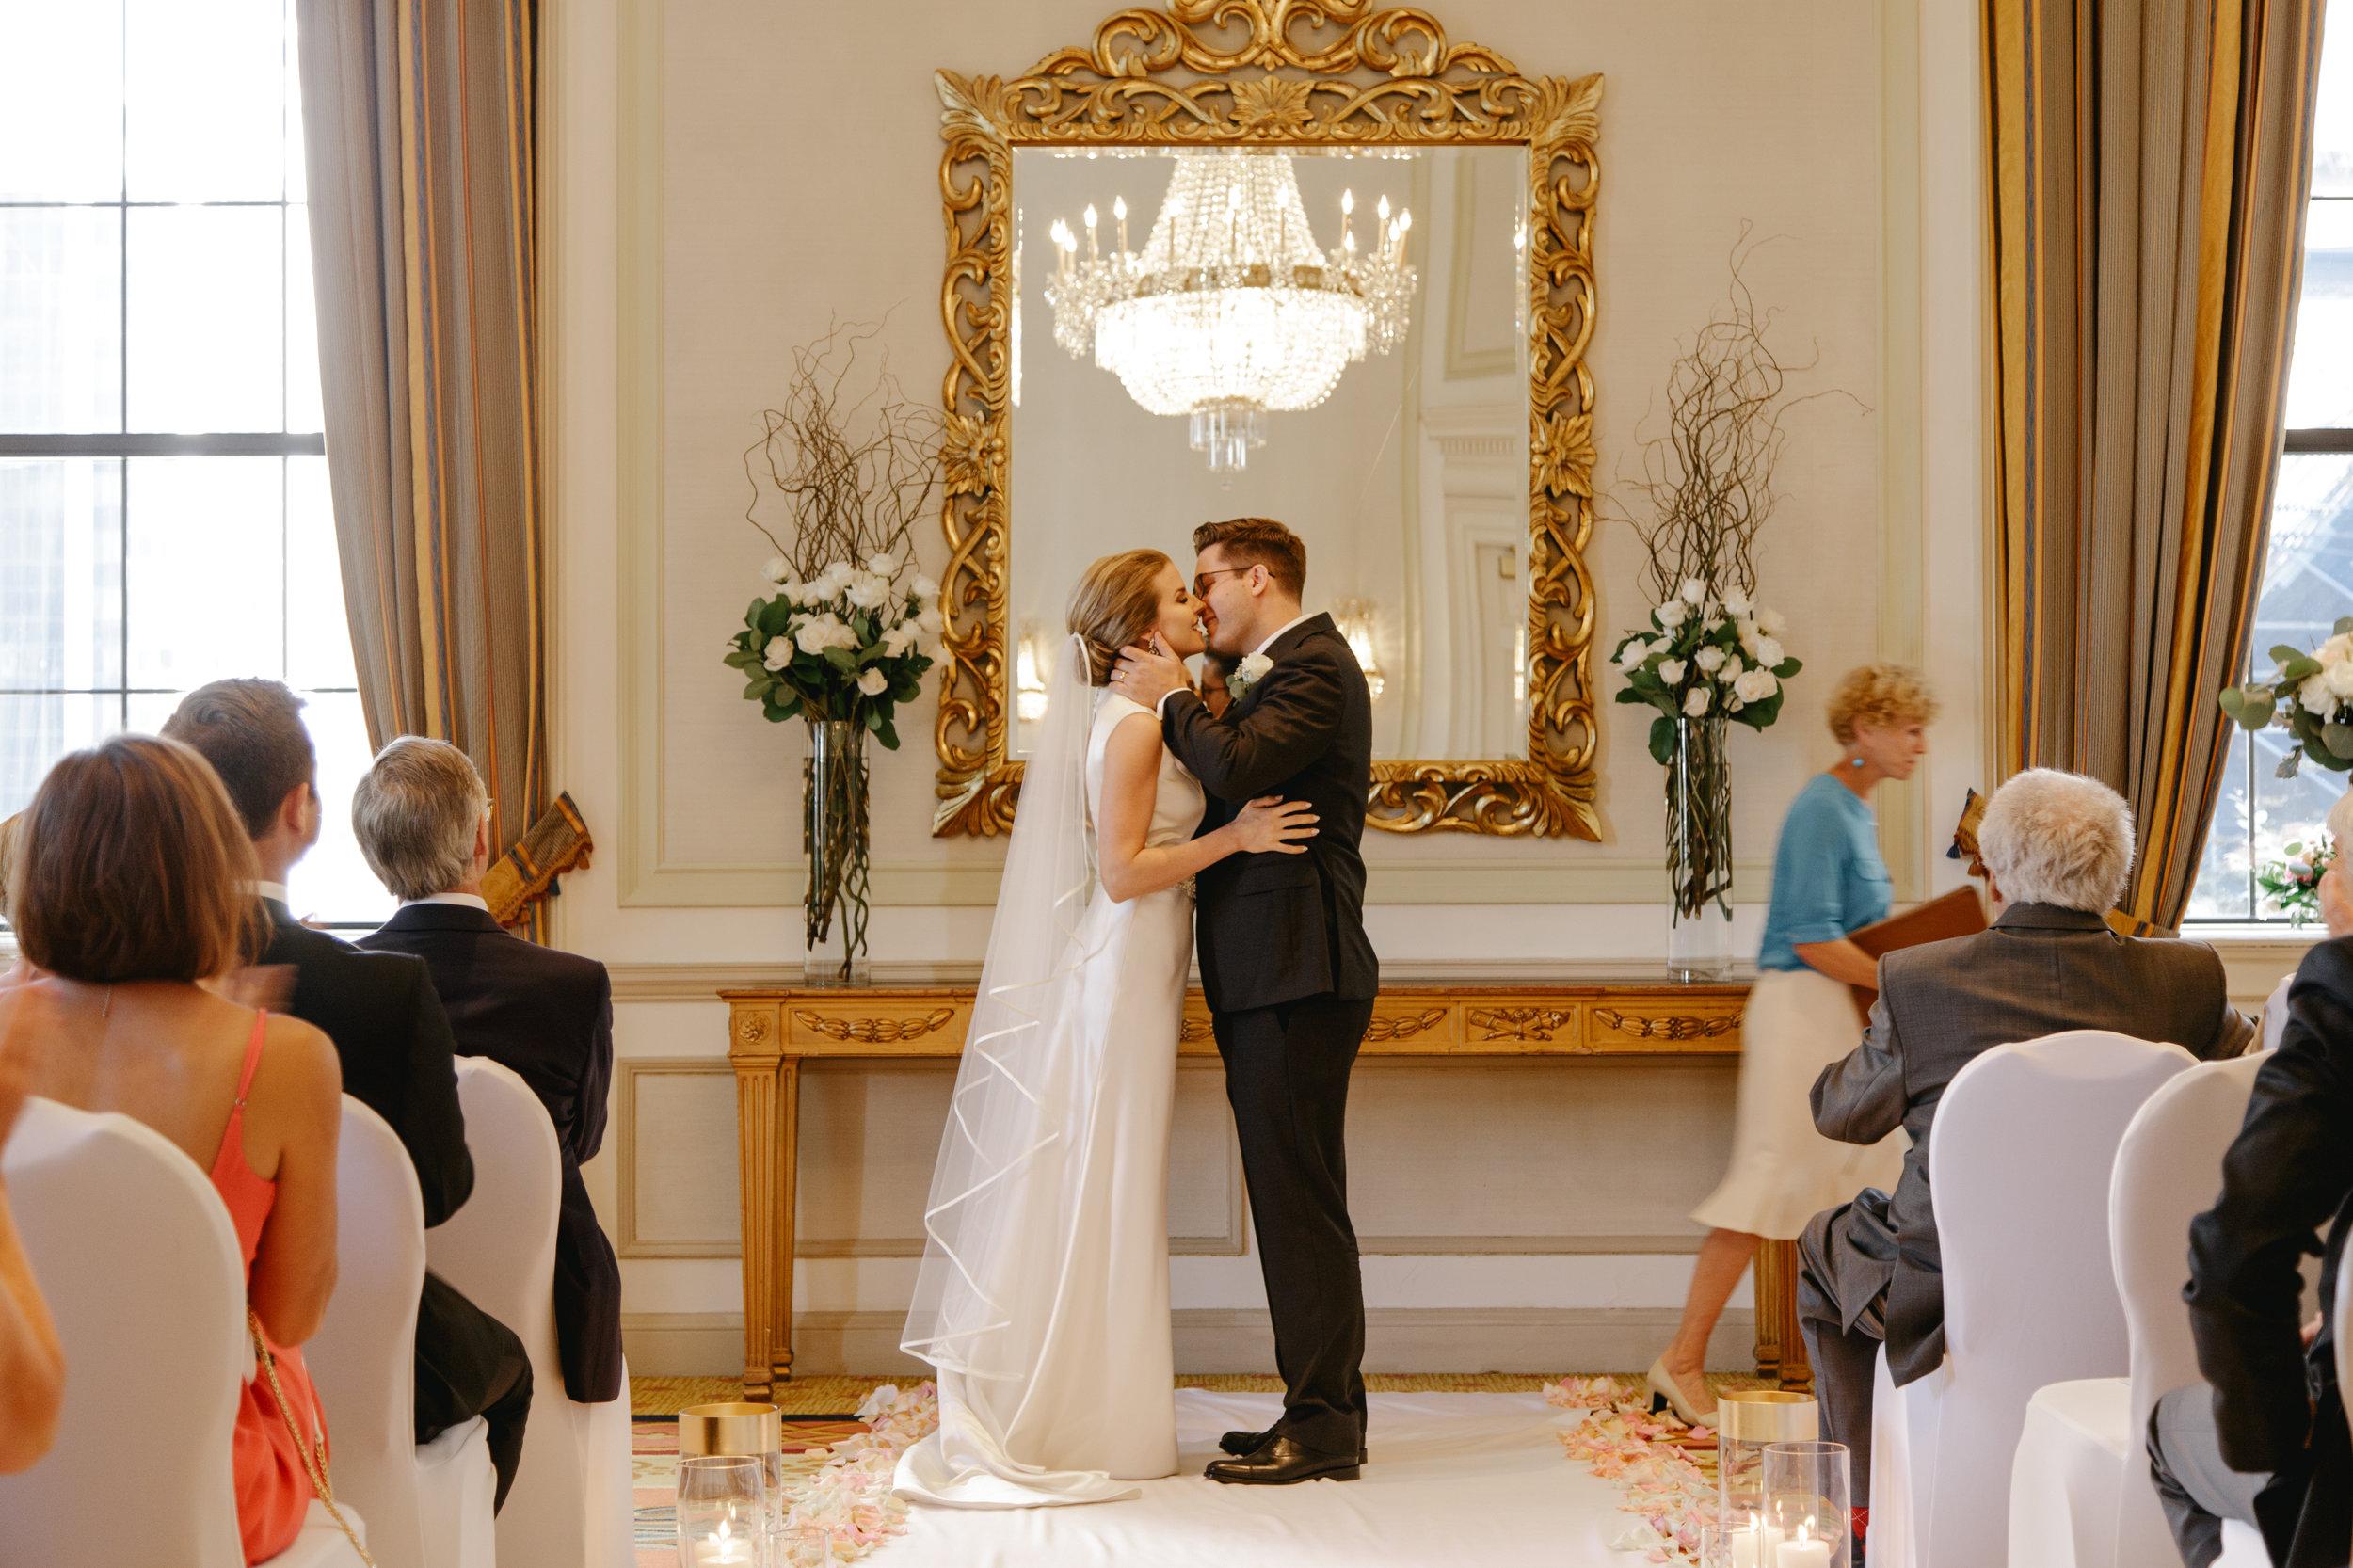 herafilms_shawna_nick_wedding_hera_selects-15.jpg